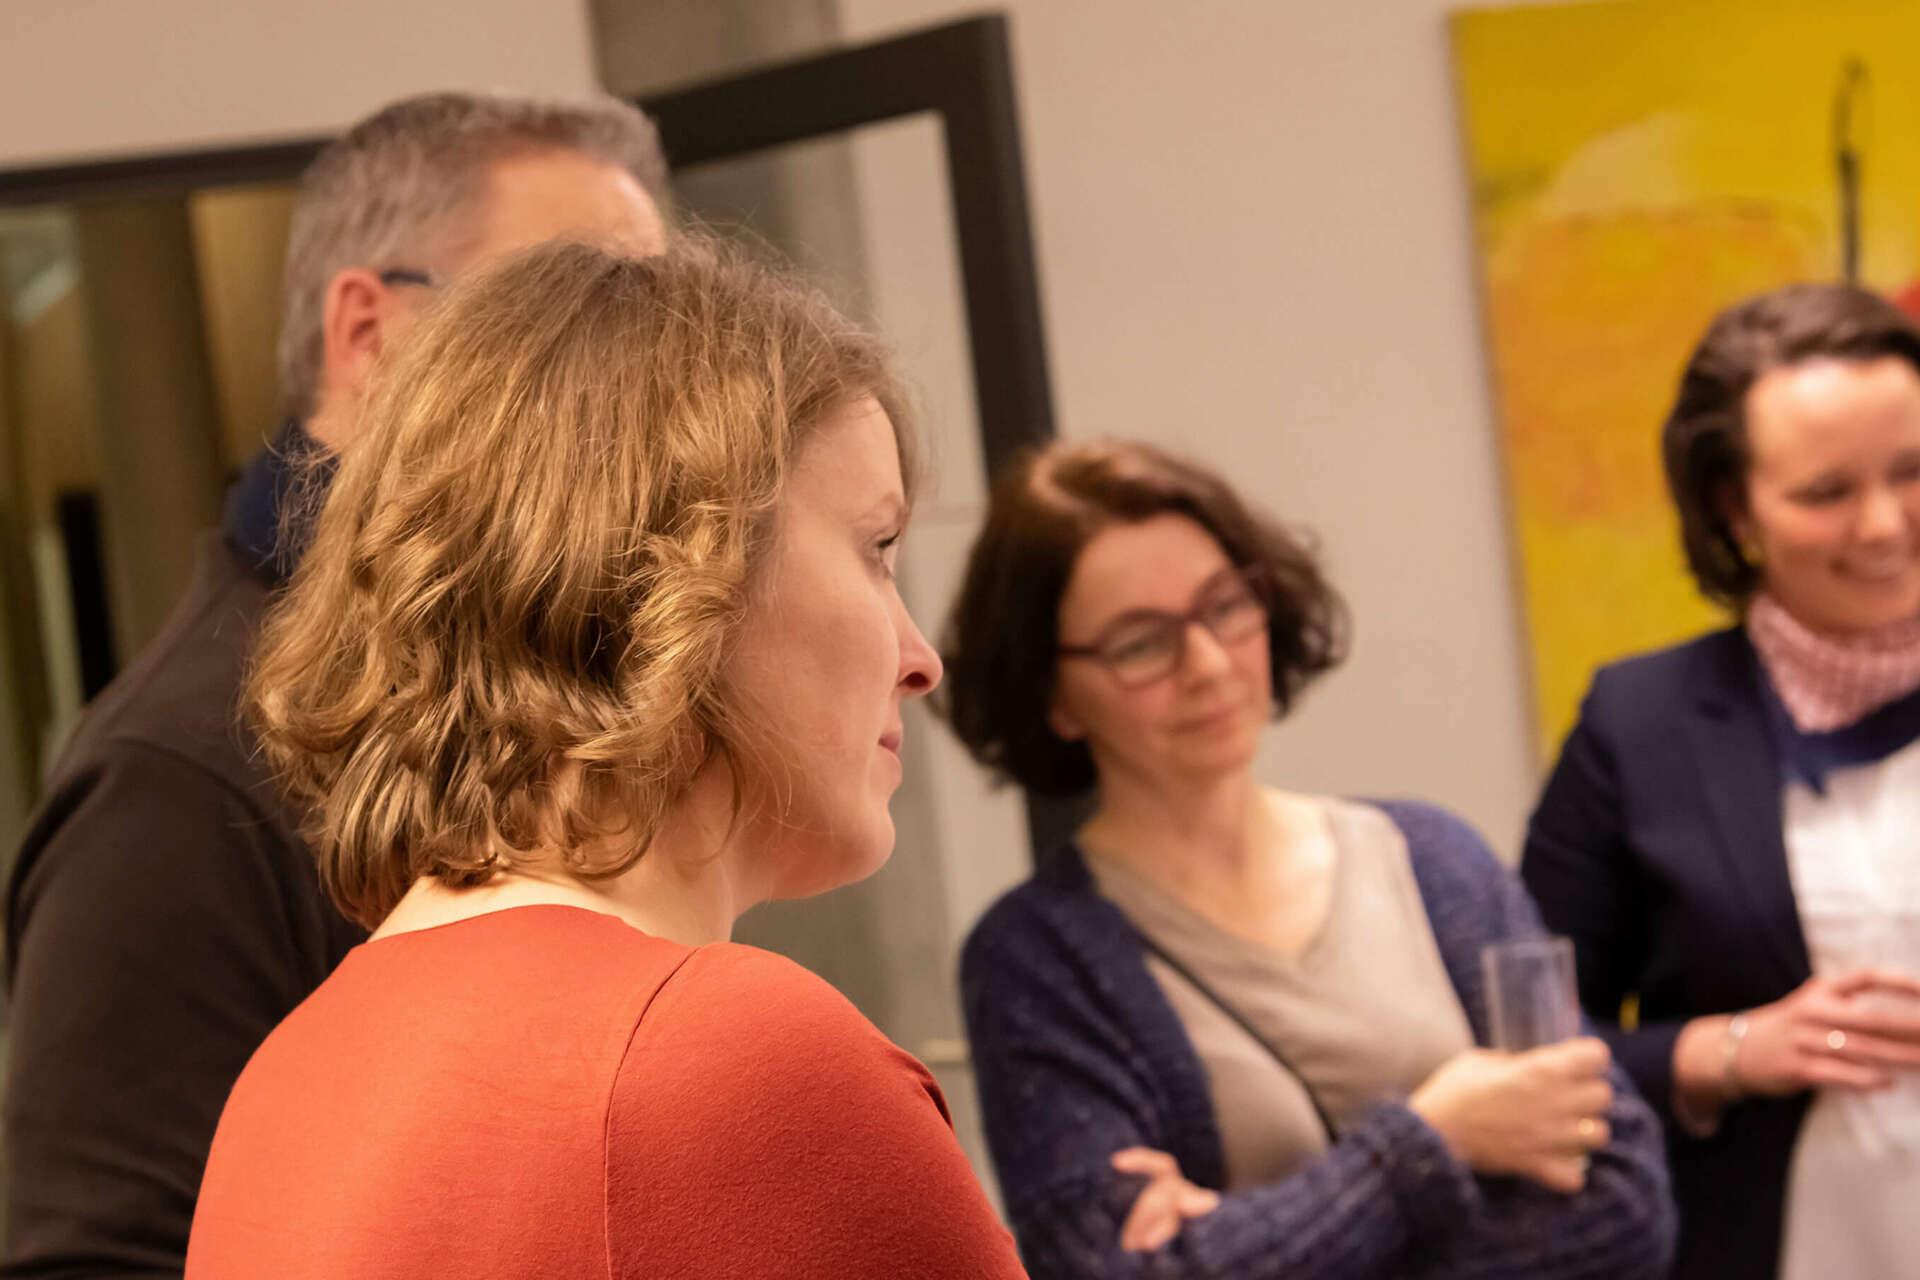 ScrumTisch Aachen – Agile Methoden im Bauprozess